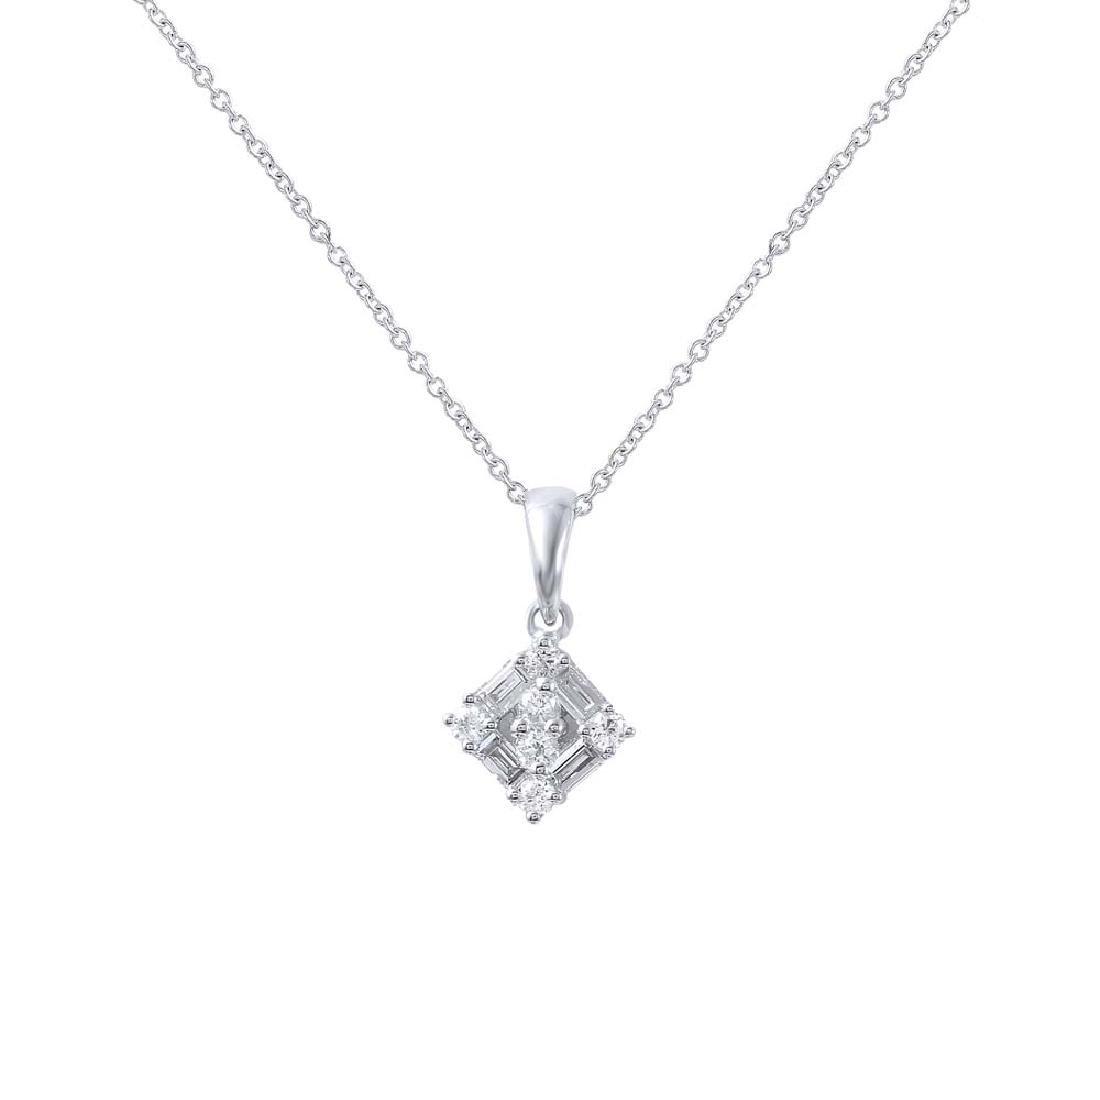 Genuine 0.29 TCW 18K White Gold Ladies Necklace